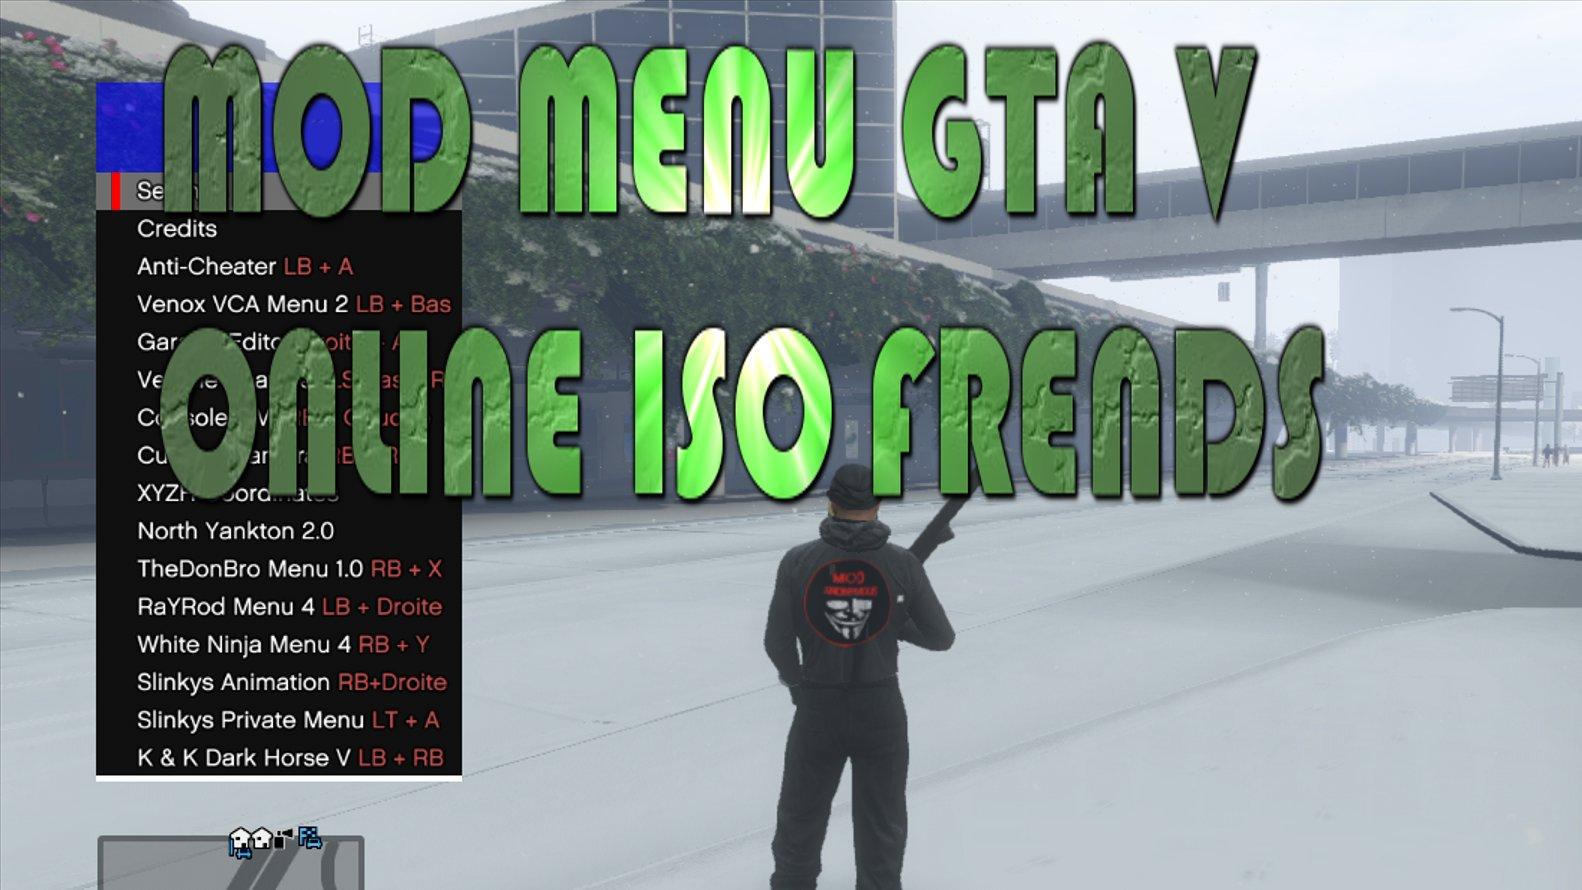 GTA V MOD MENU XBOX 360 LT 3 0 - 7227807982 - oficjalne archiwum allegro